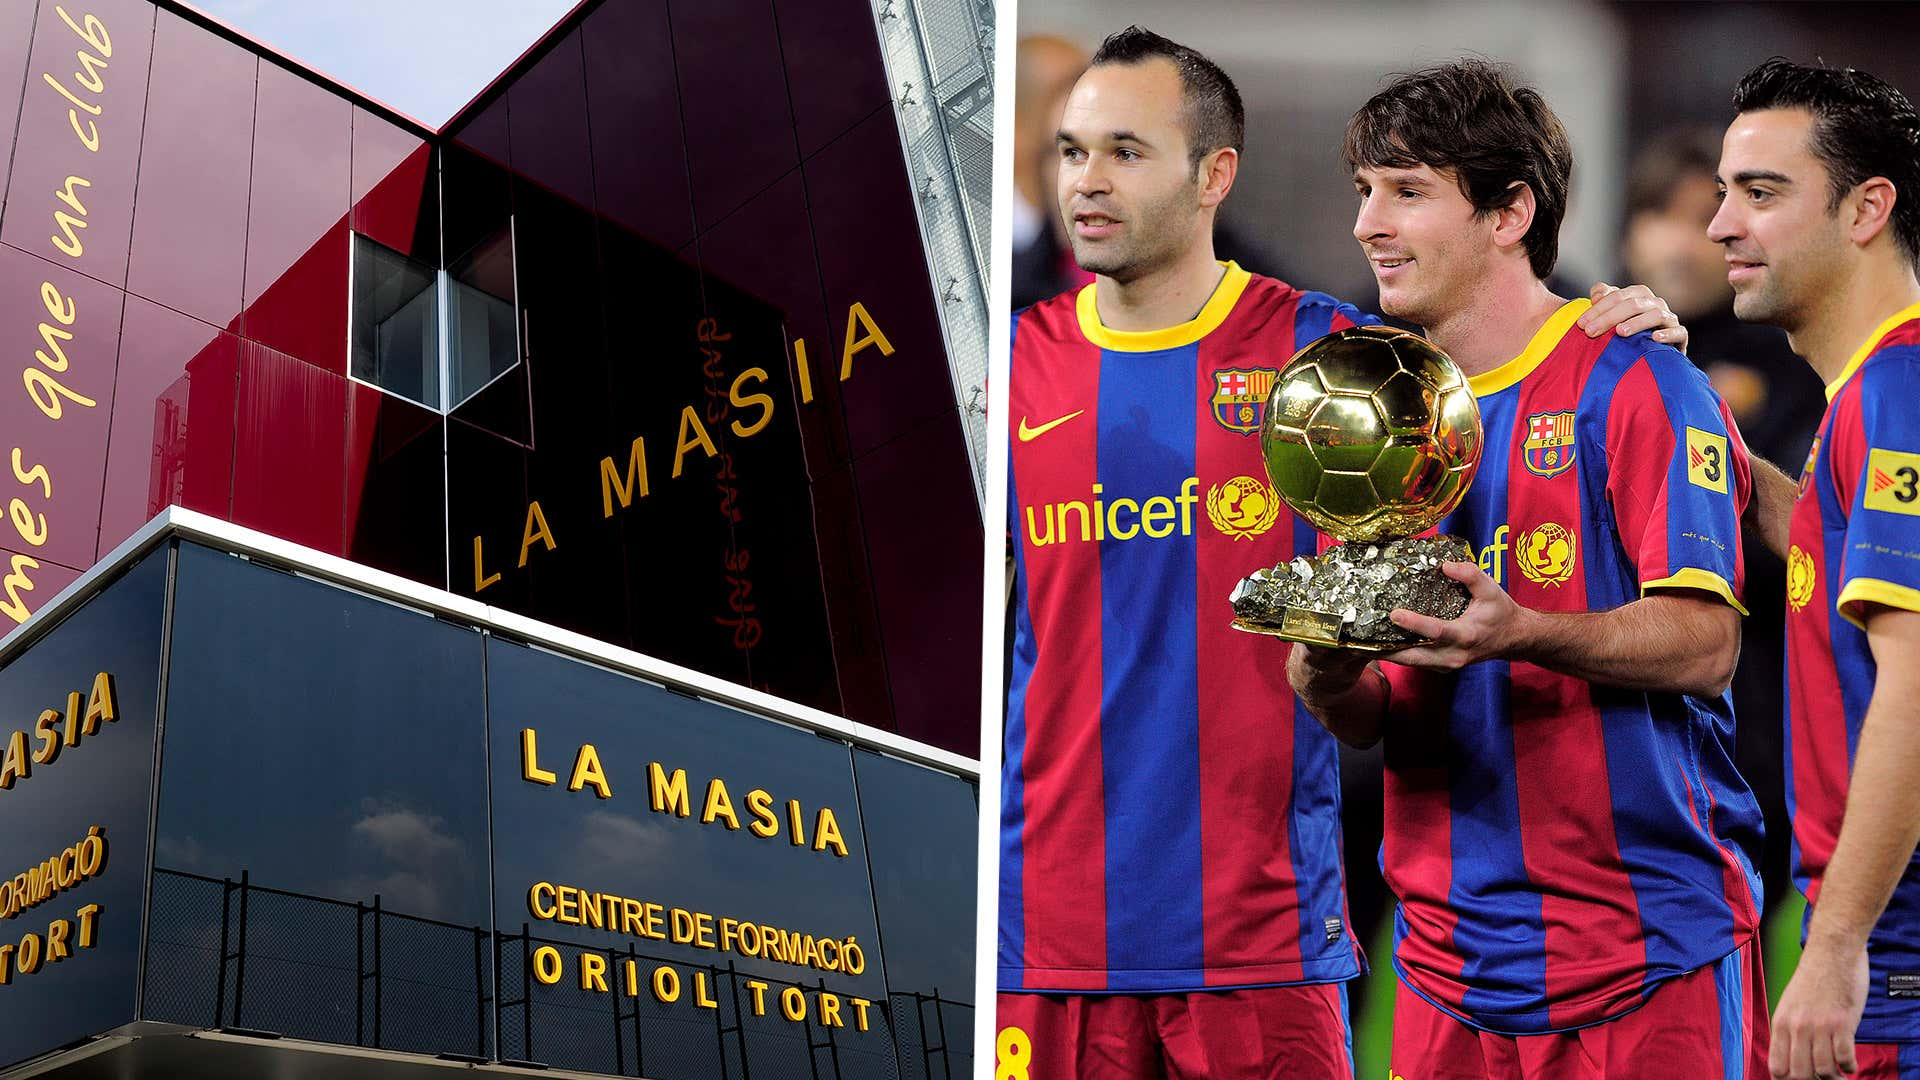 La Masia Andres Iniesta Lionel Messi Xavi Barcelona